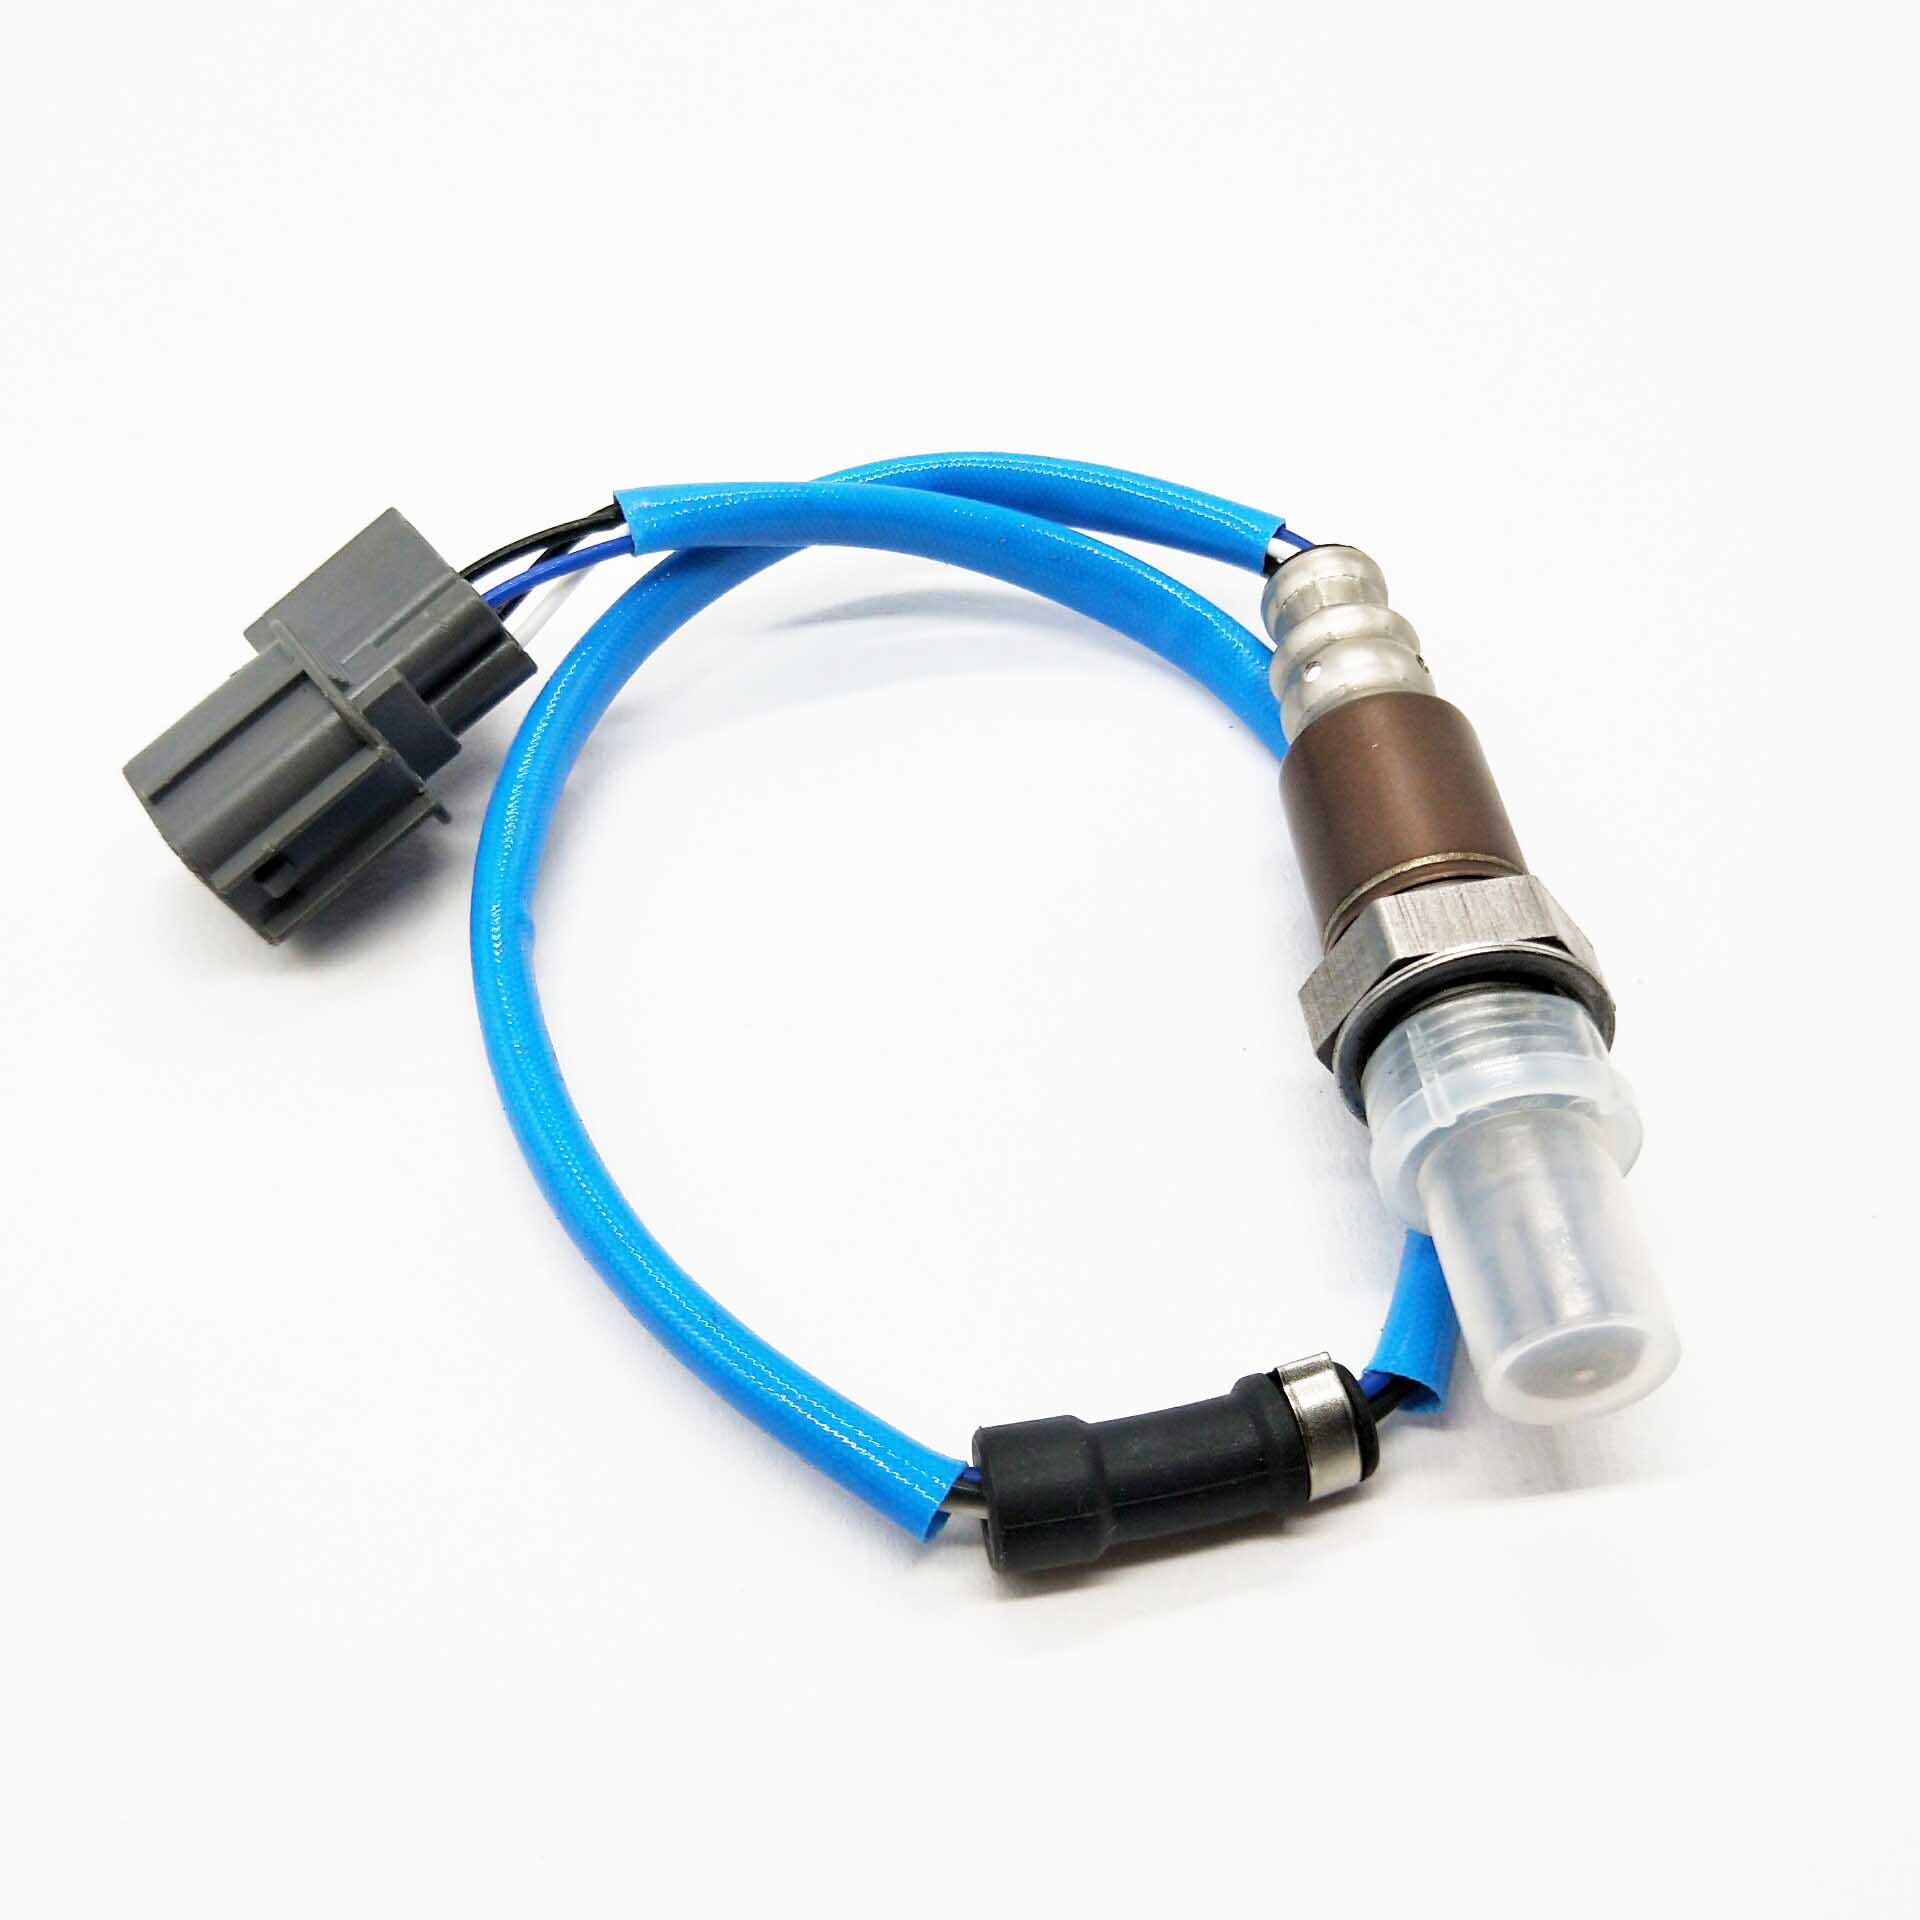 Image 2 - Air Fuel Ratio Lambda Probe Oxygen O2 Sensor Front  For HONDA  Stream RN 3 Engine Code K20A 36531 PNE 003 36531PNE003 234 9065Exhaust  Gas Oxygen Sensor